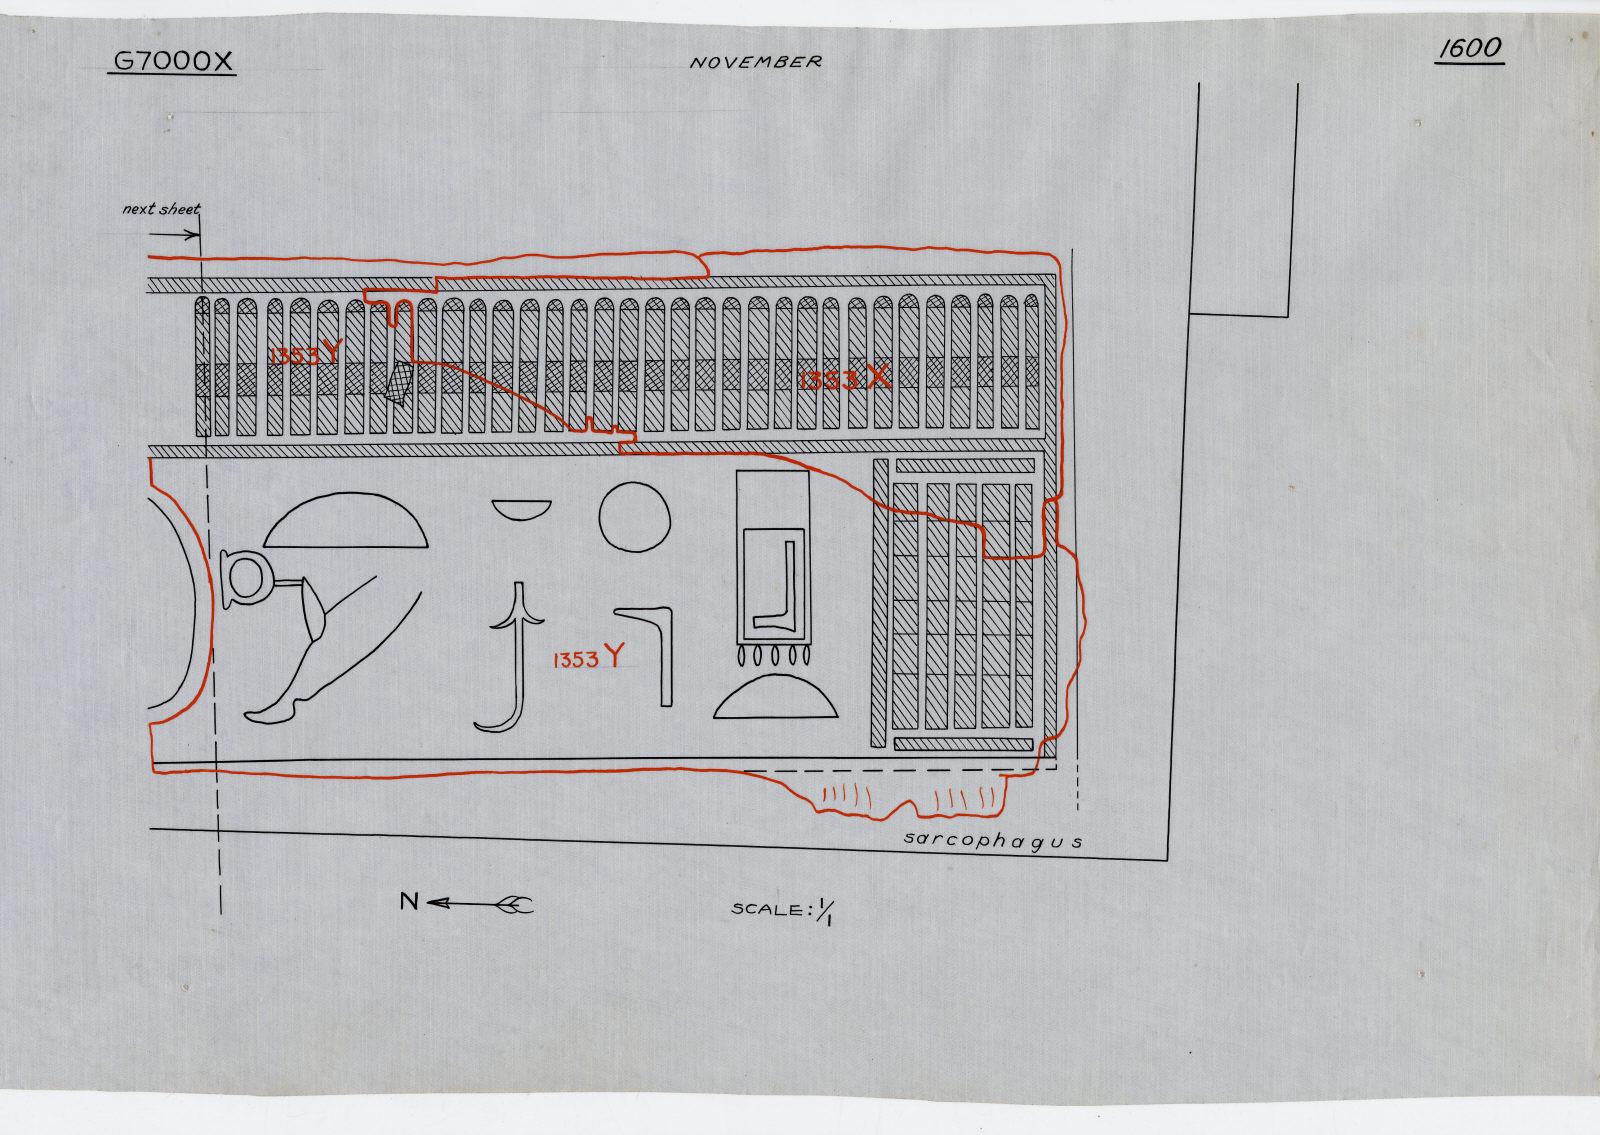 Drawings: G 7000 X: inlaid board